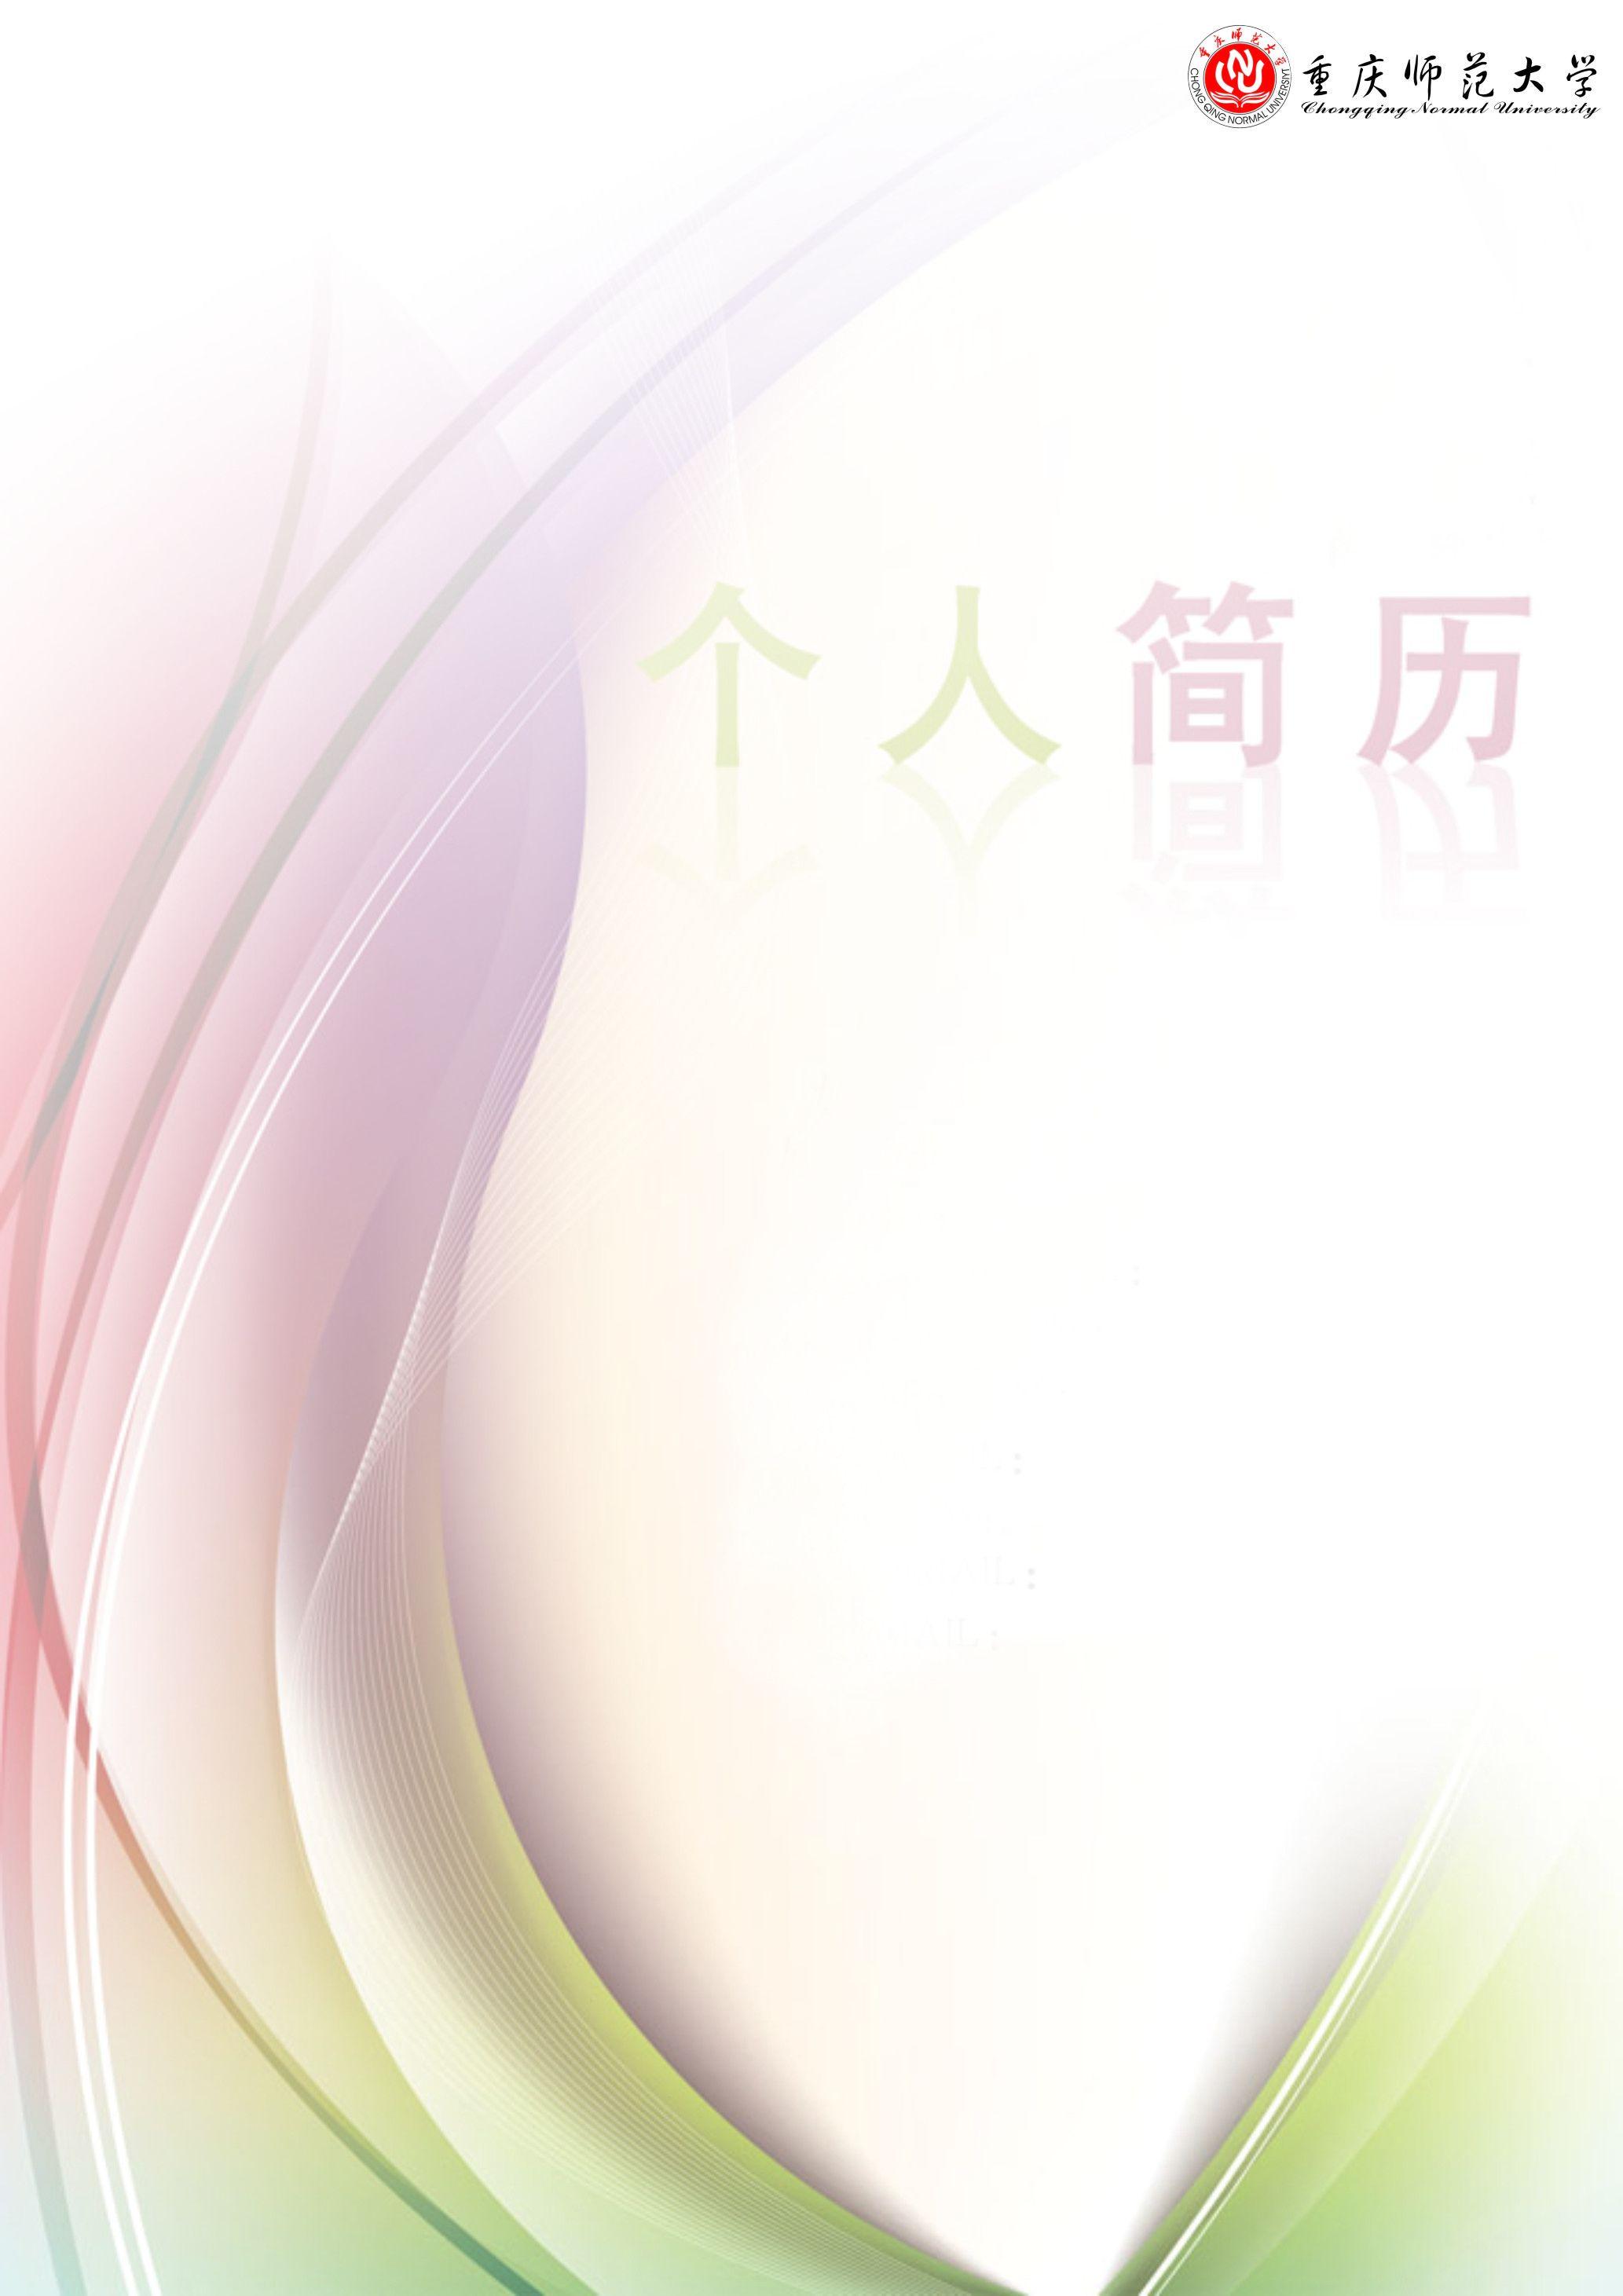 word背景图片黑白